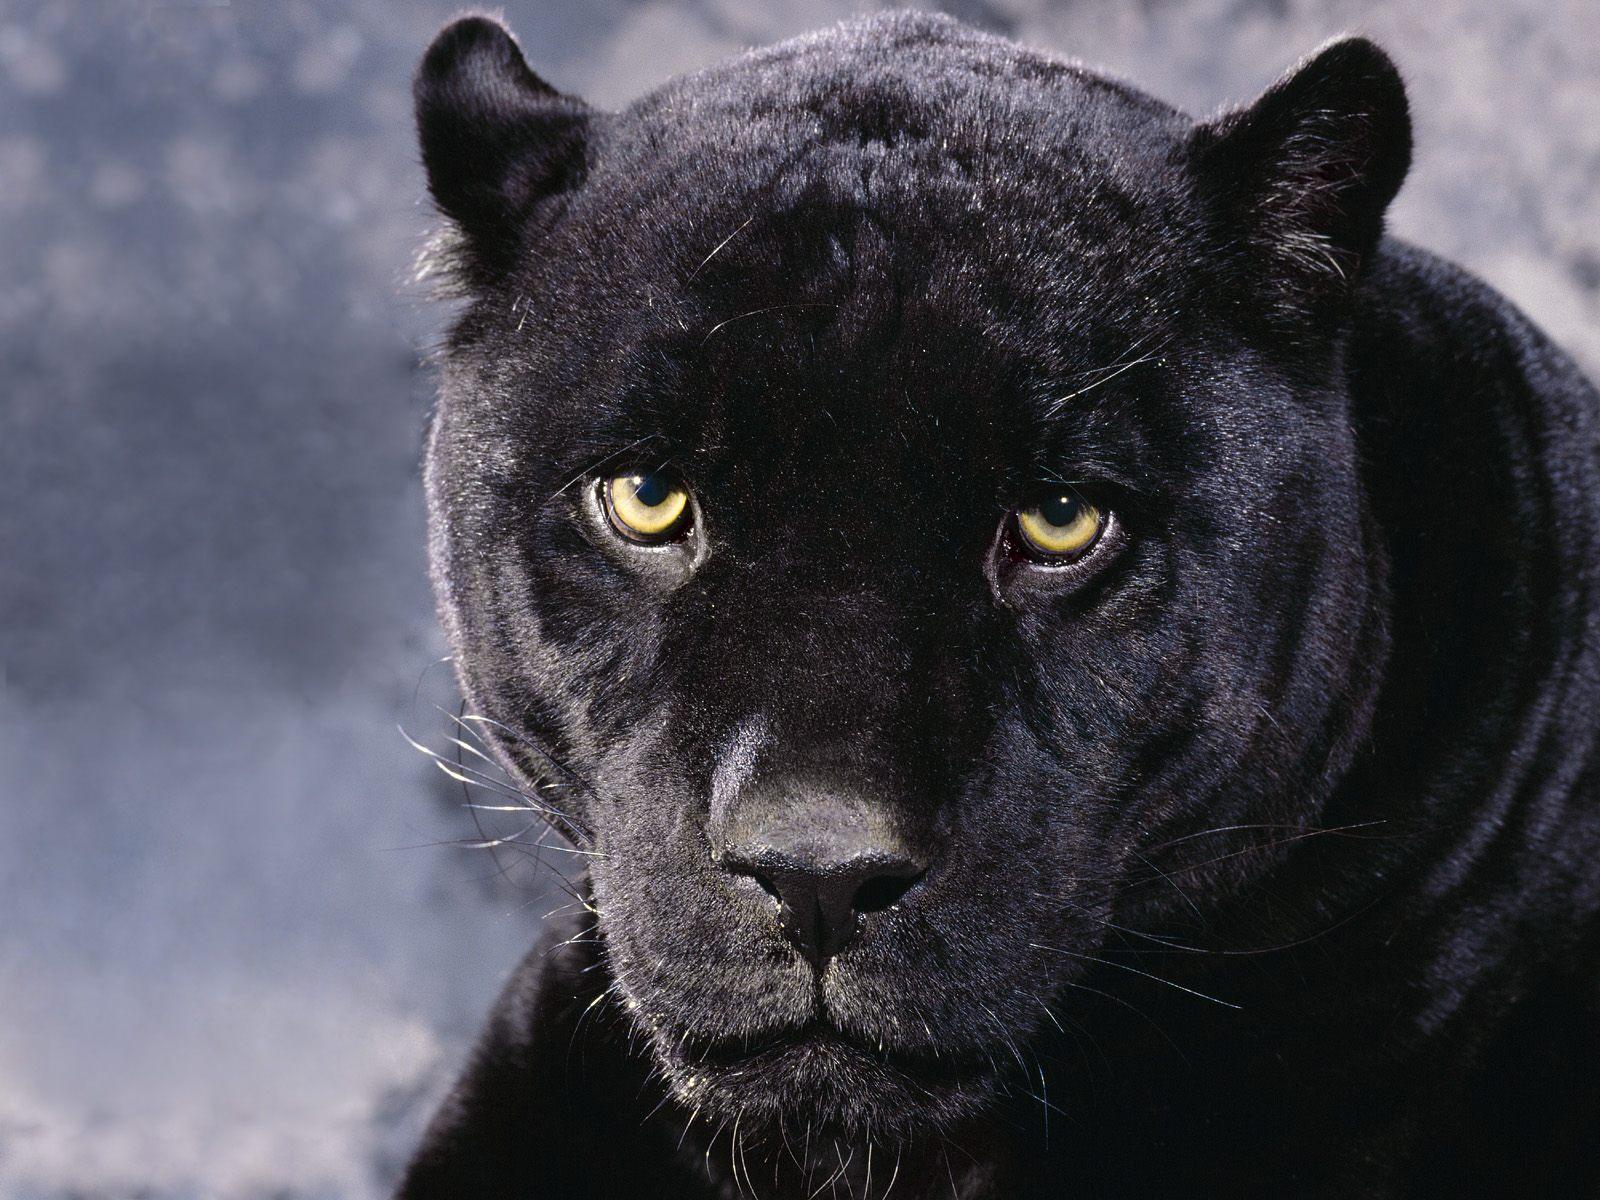 Big Black Panther Wallpaper - Hd Wallpapers-2704